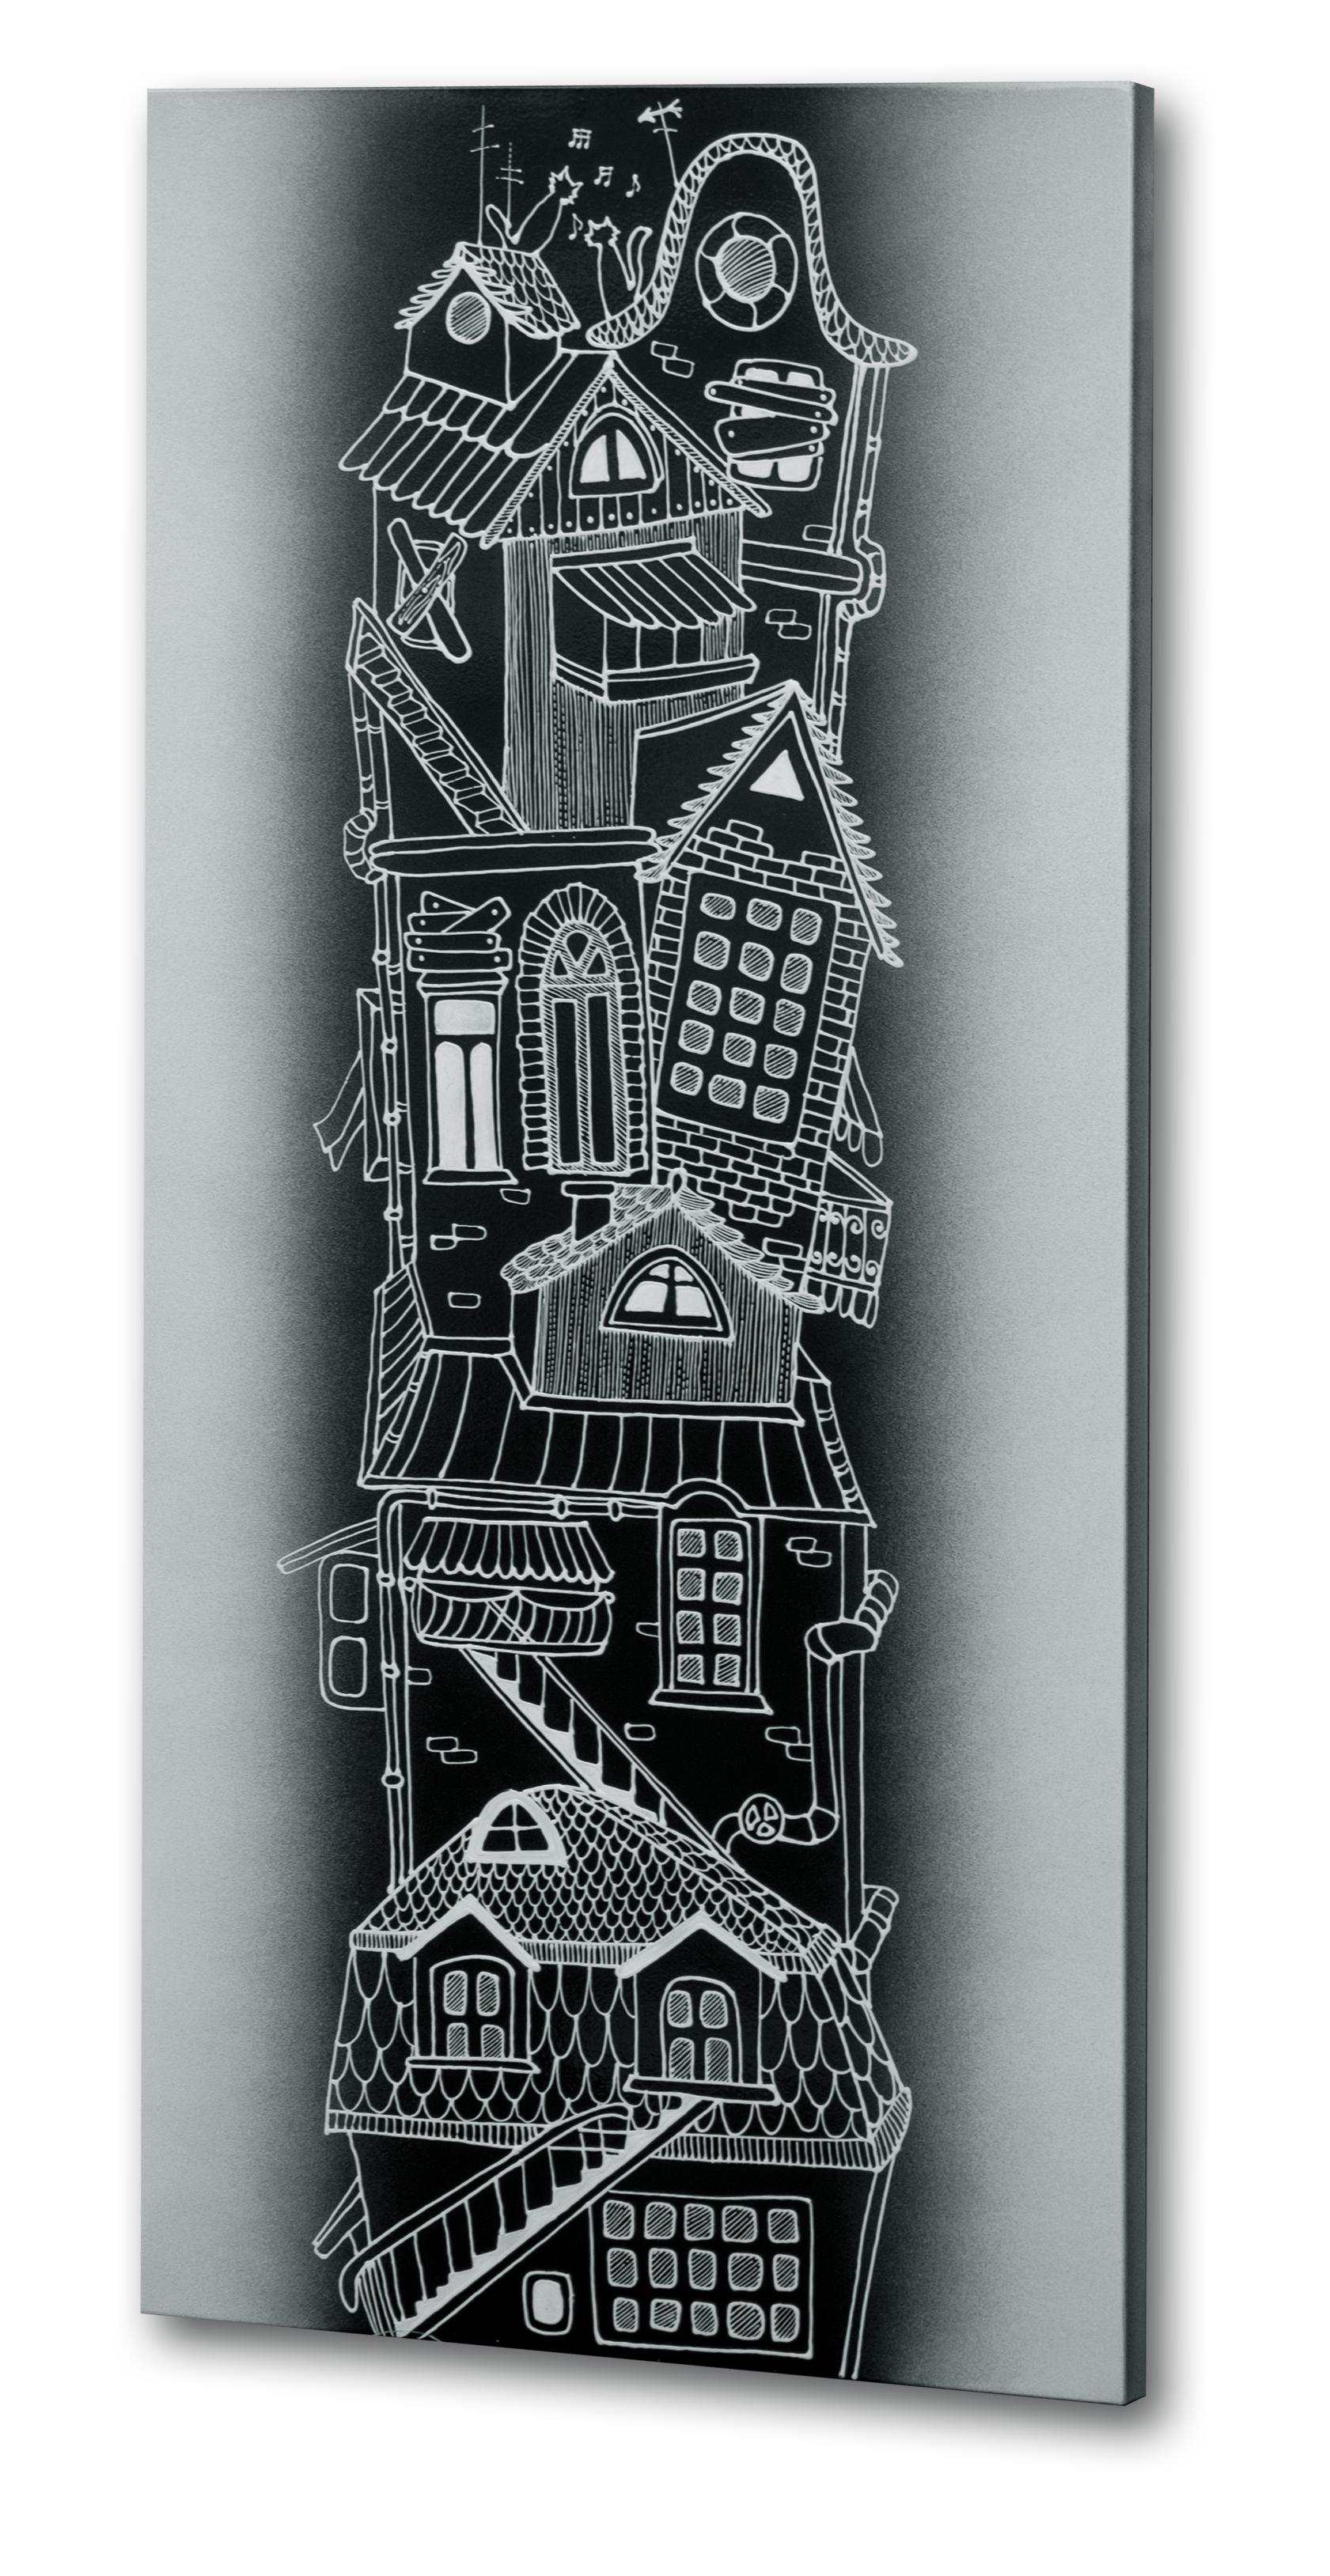 Dizajn - Little house